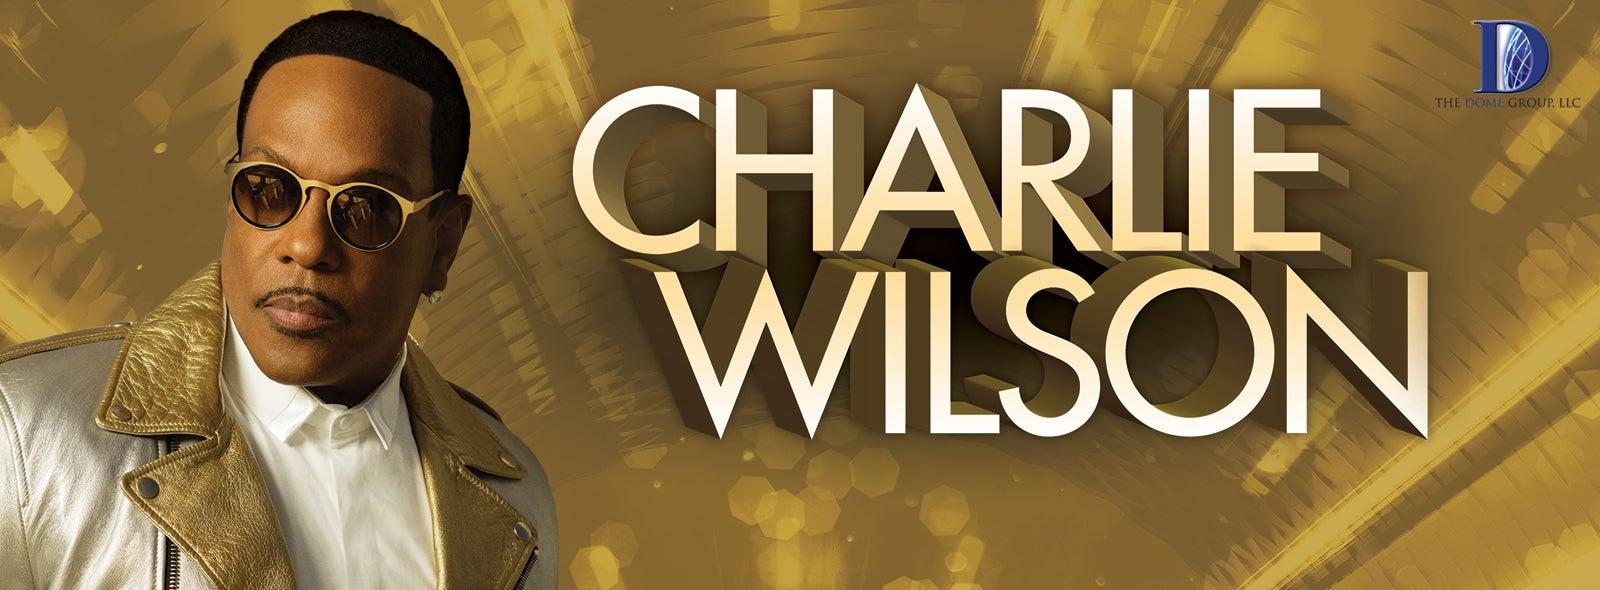 Charlie Wilson 2019